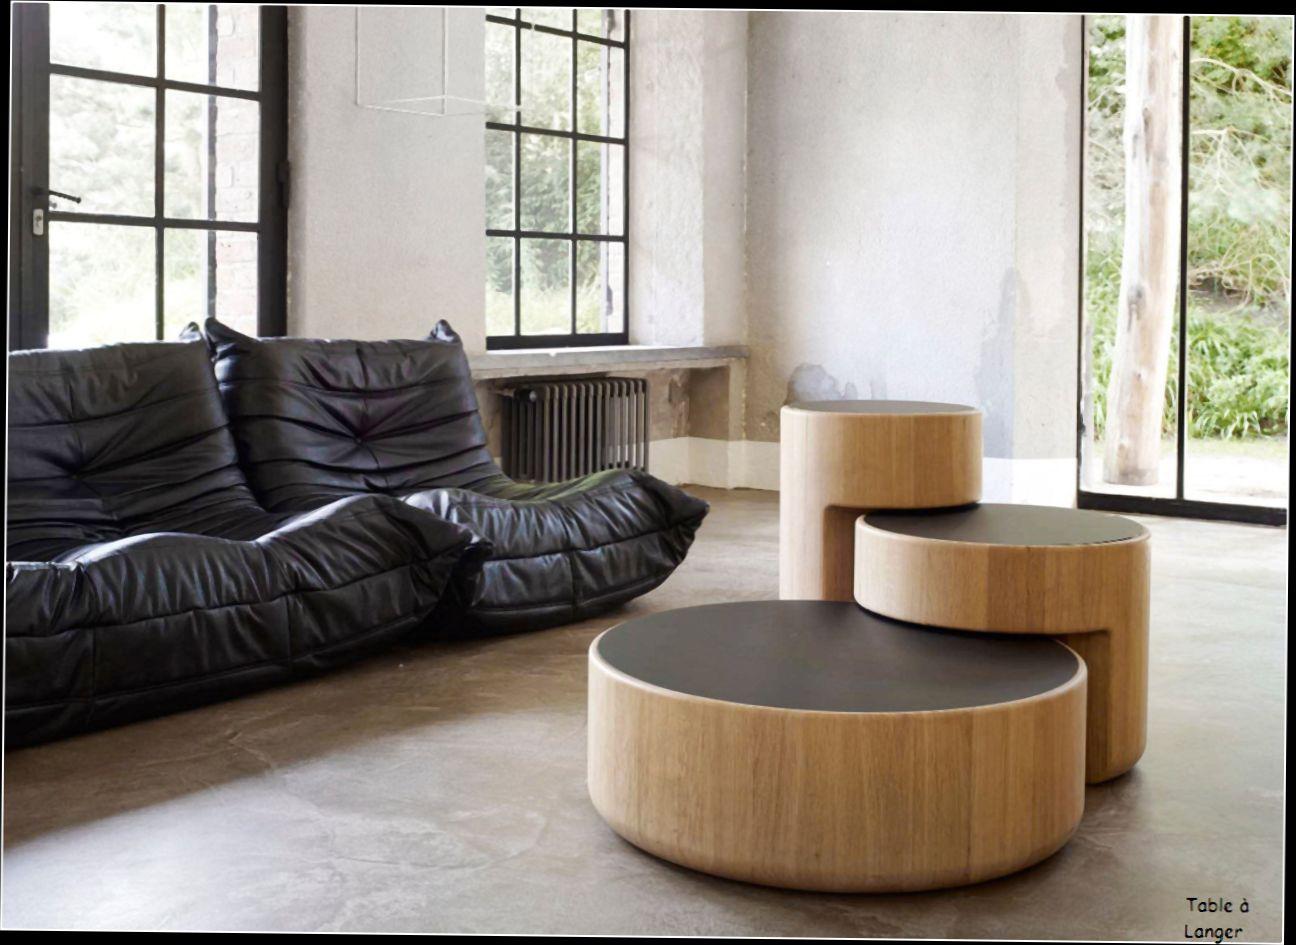 Table Basse Gigogne Contemporaine Atwebsterfr Maison Et Mobilier